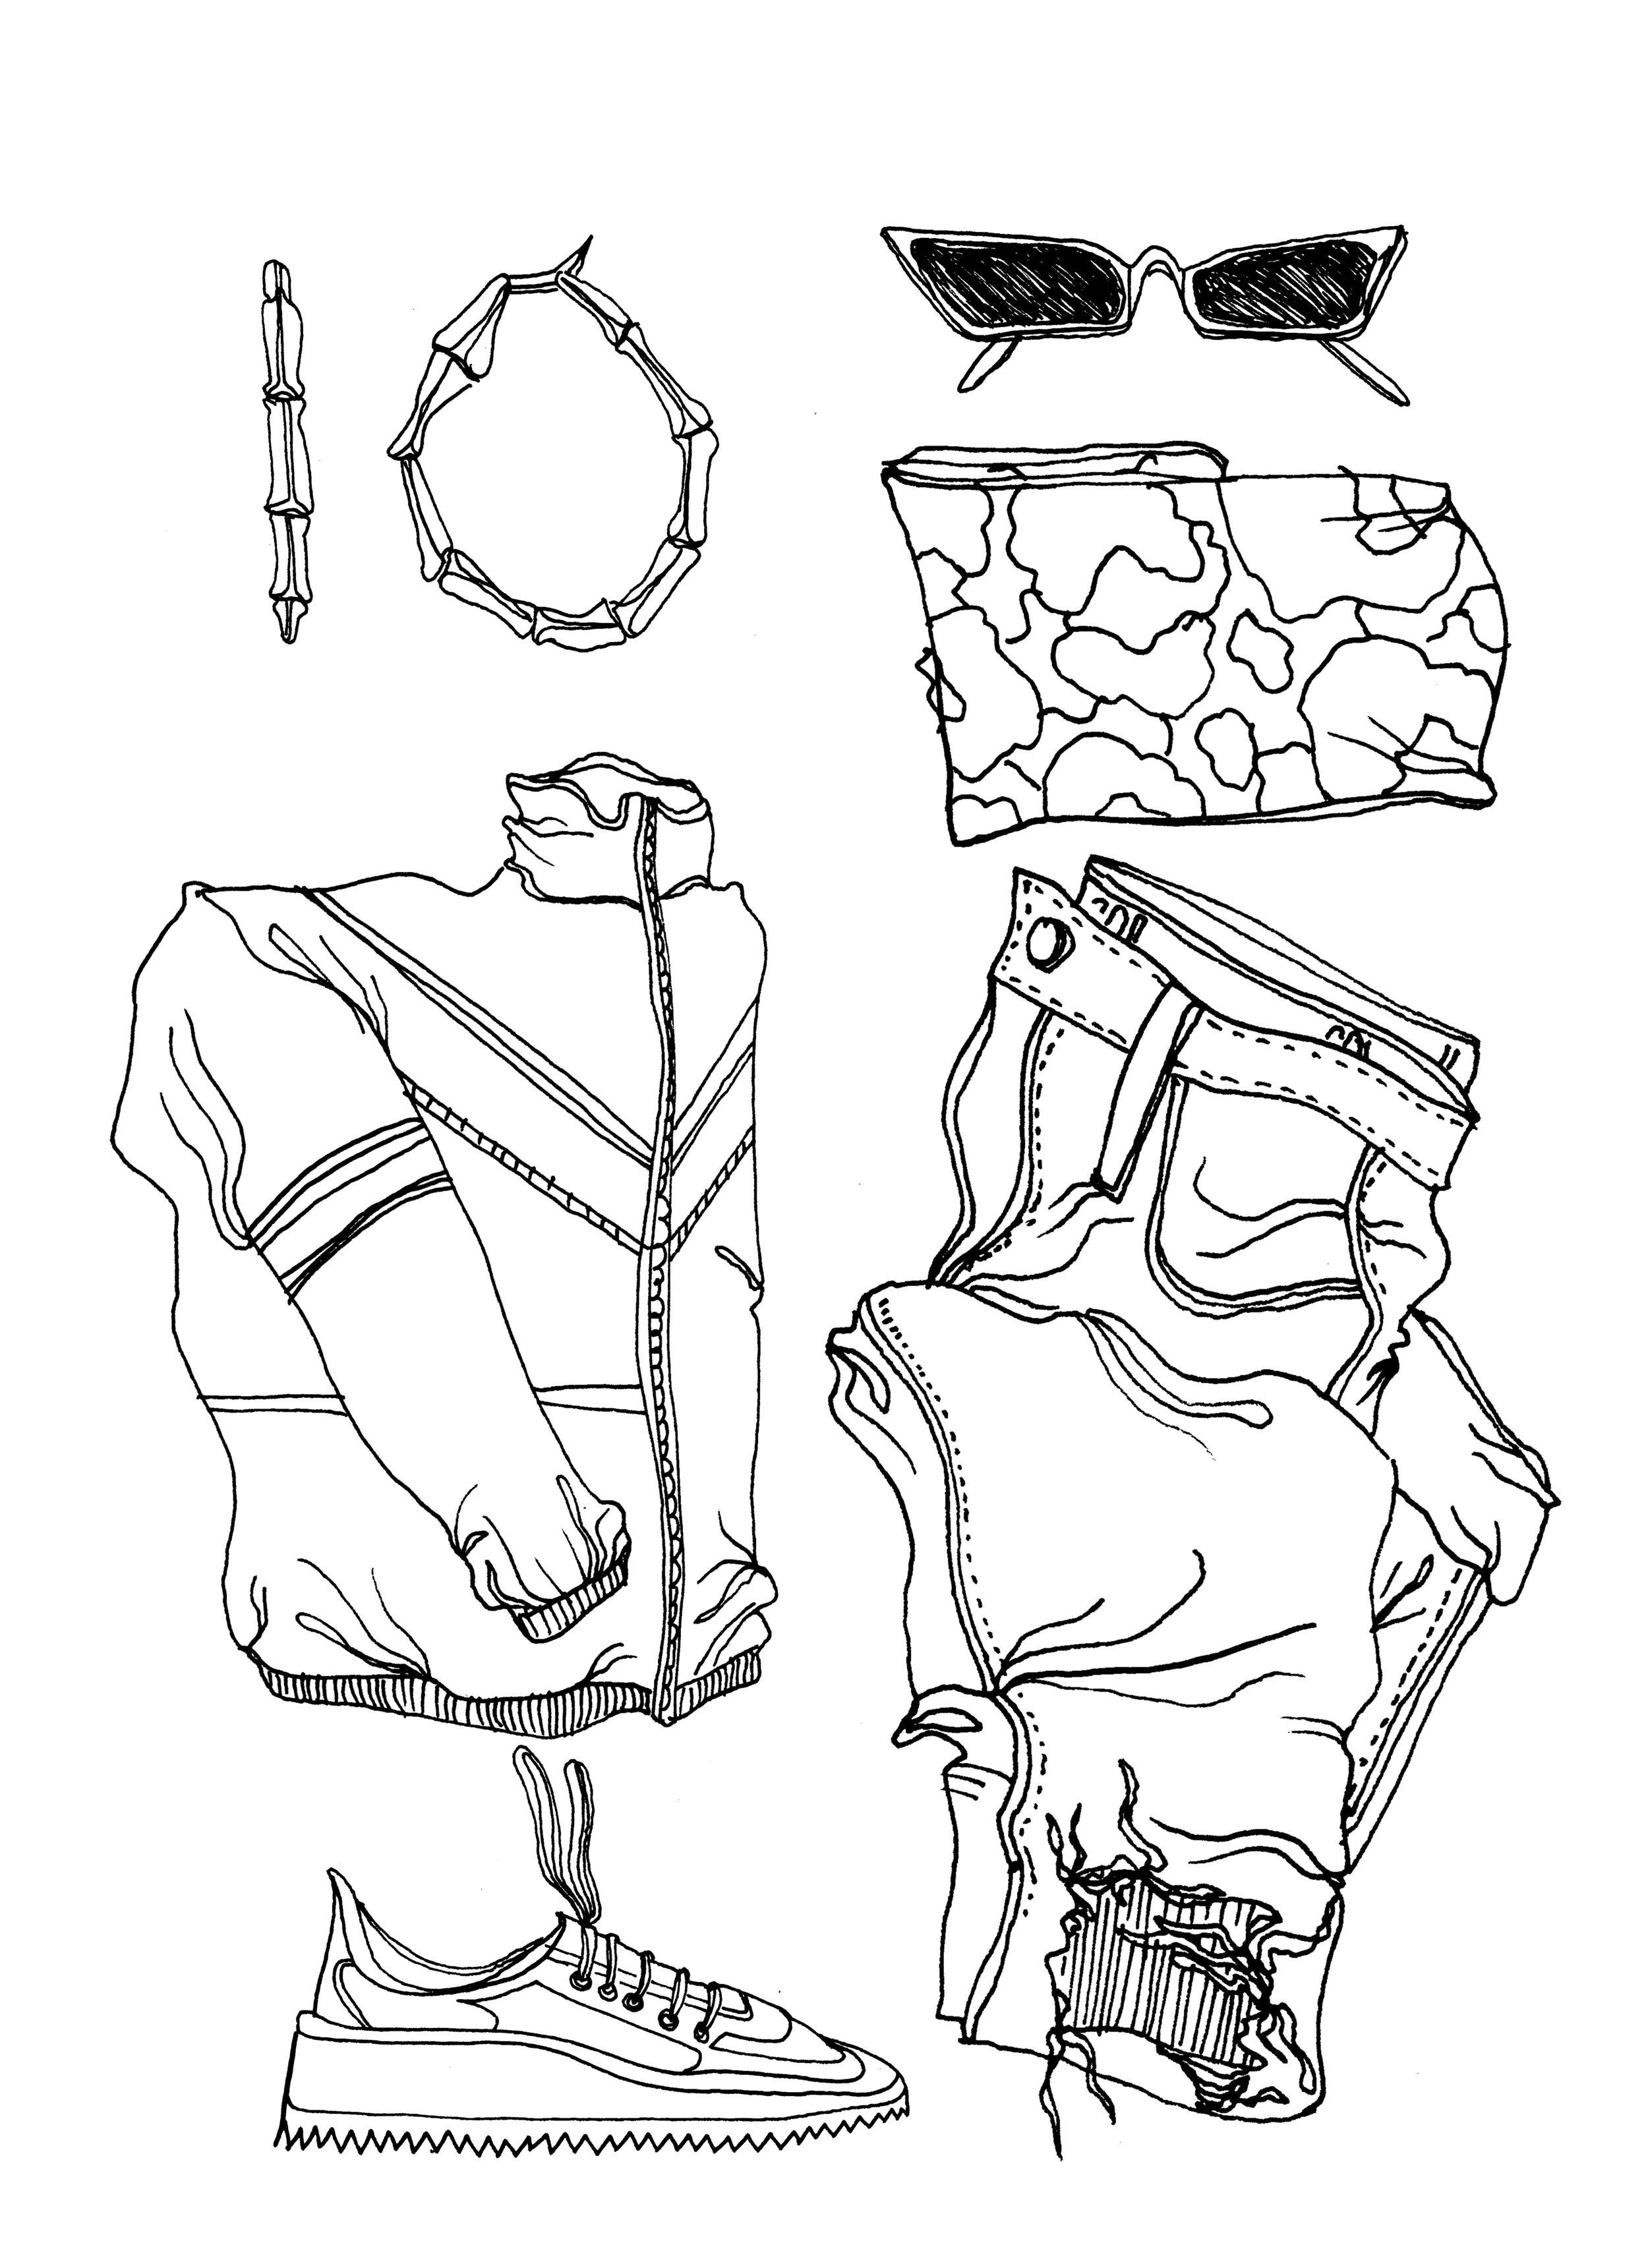 The Streetwear Diva Style interpreted by Amy Leonard